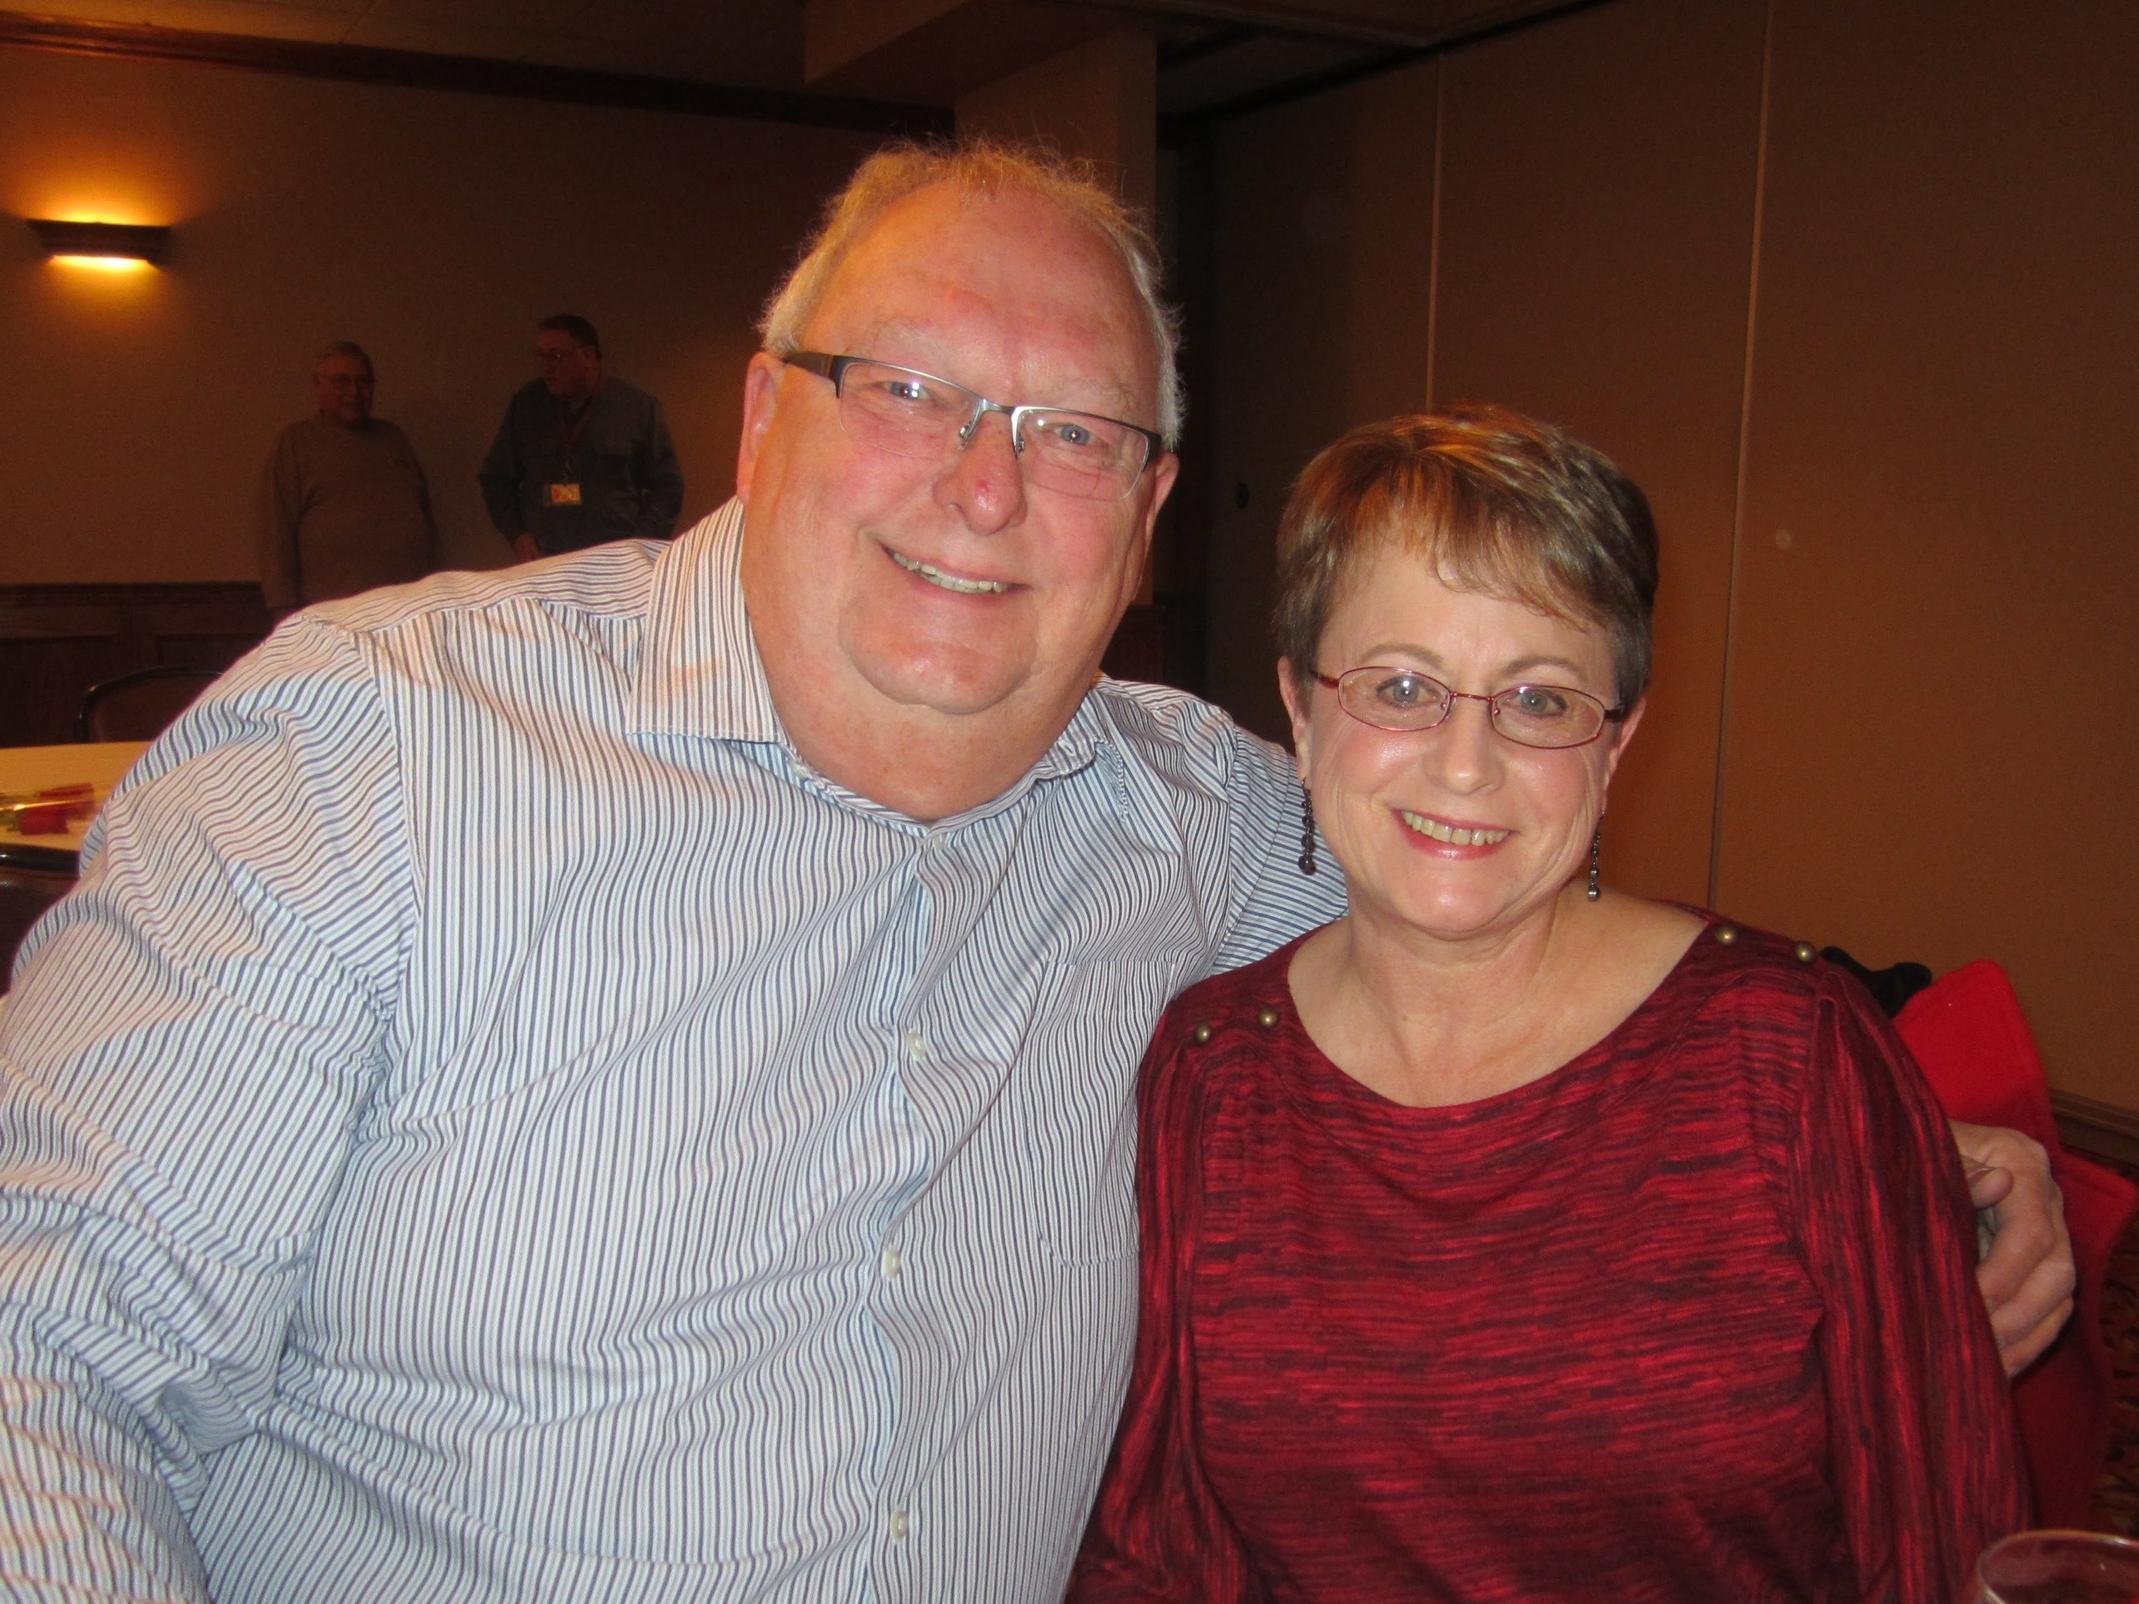 Buddy & Stephanie Turner